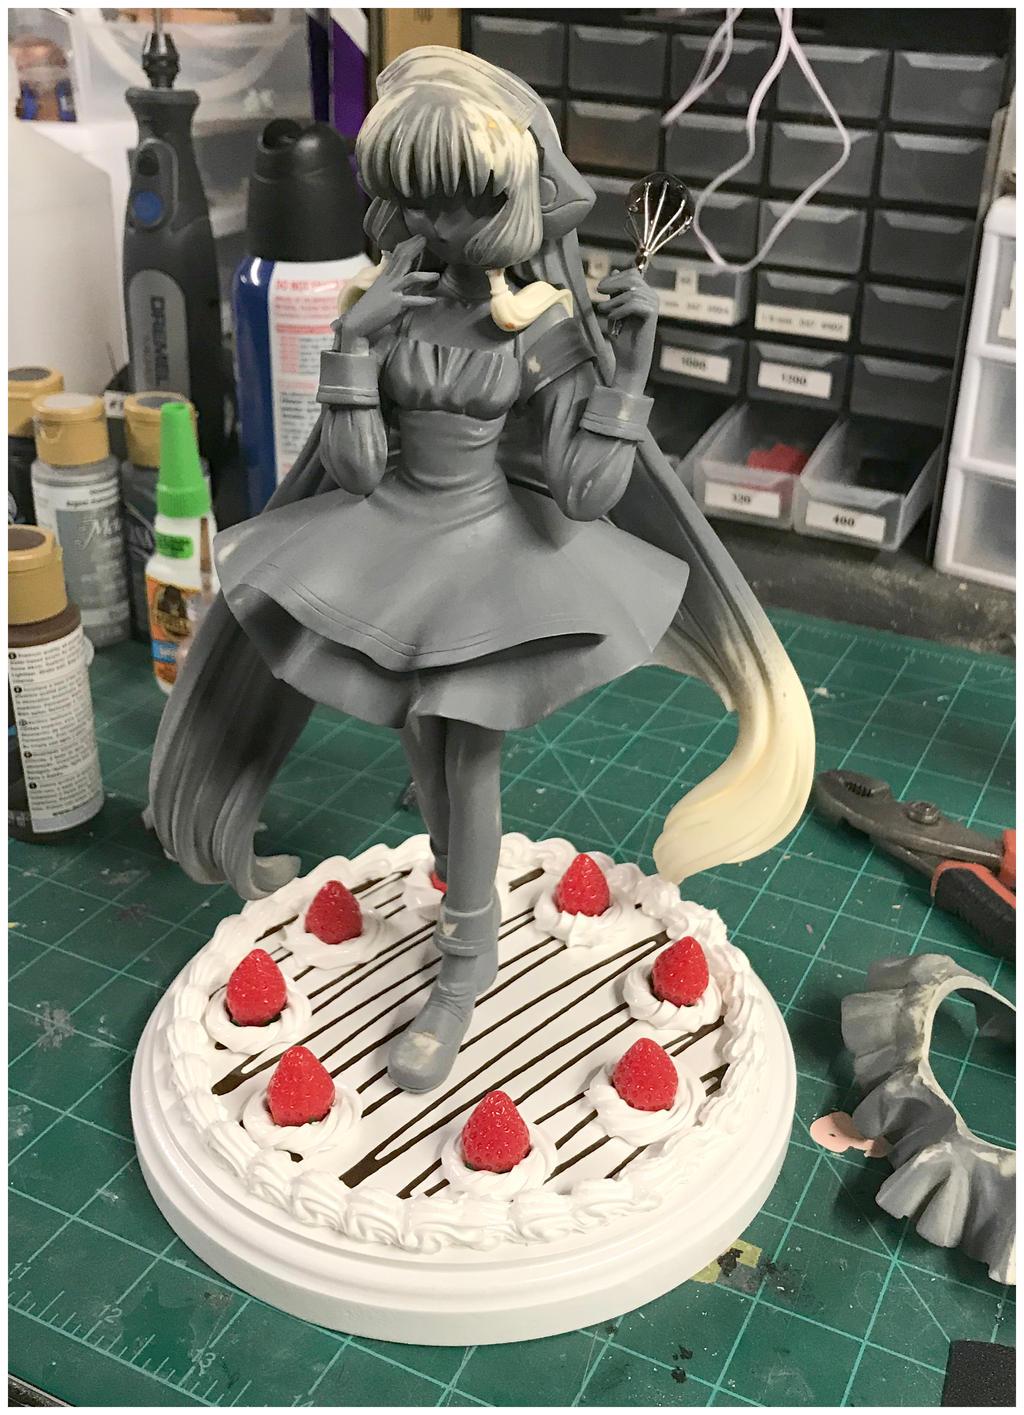 WIP Chii (with Custom Cake Base) by EmeraldAngelStudio